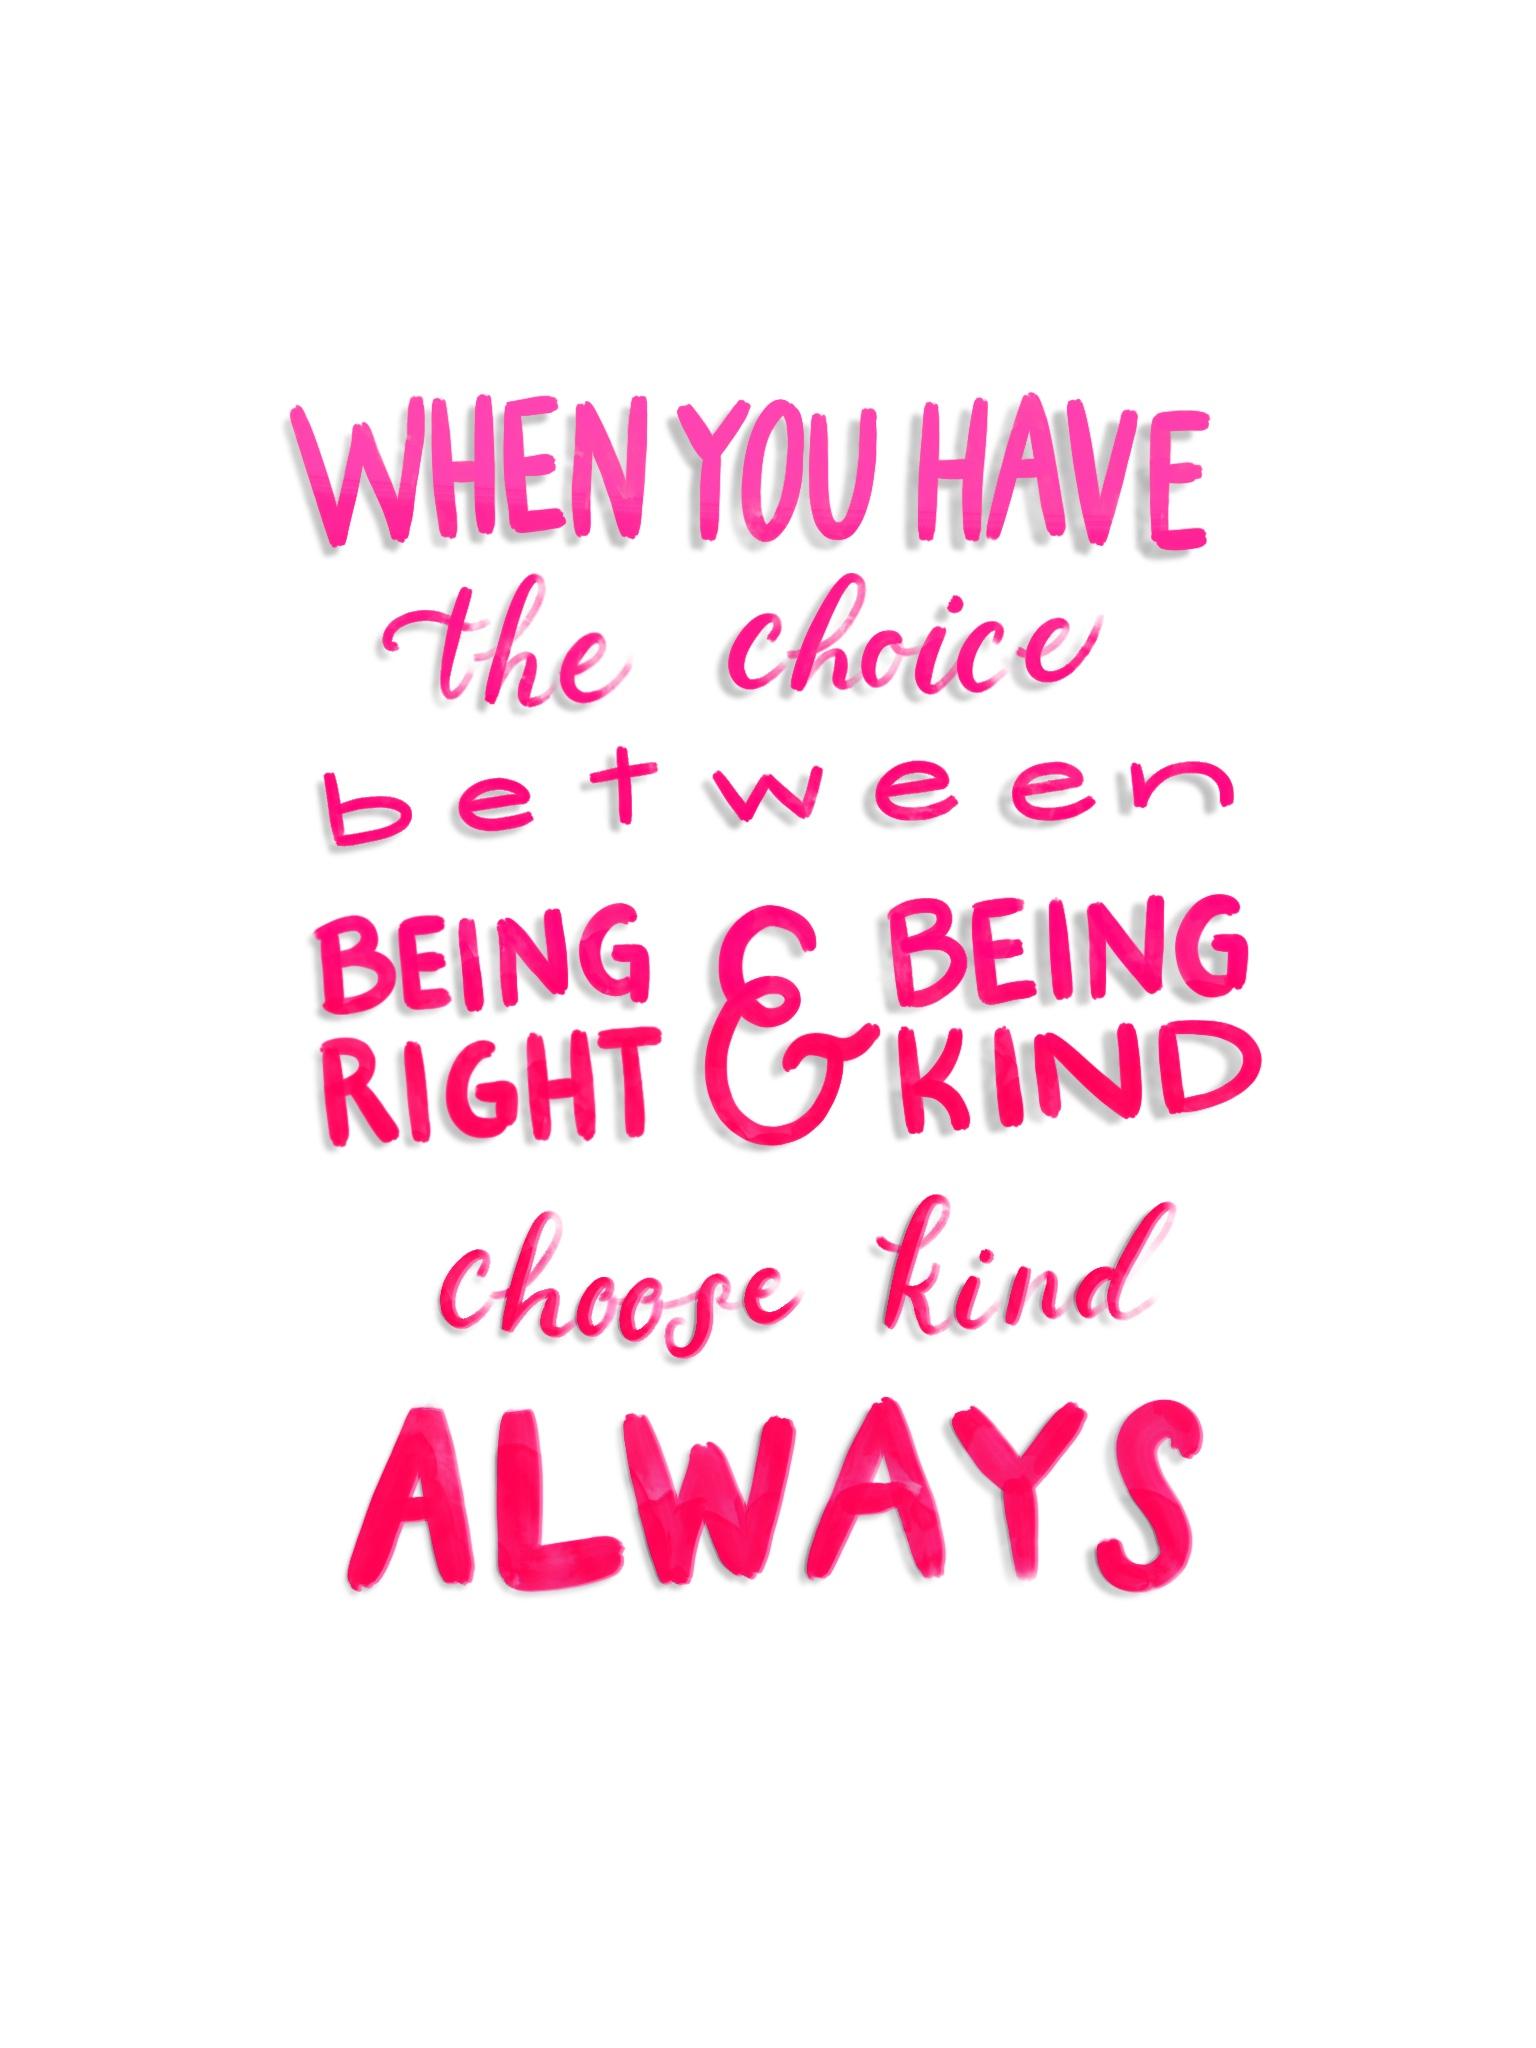 kindness-happy-life-quotes-briana-christine-ipad-lettering